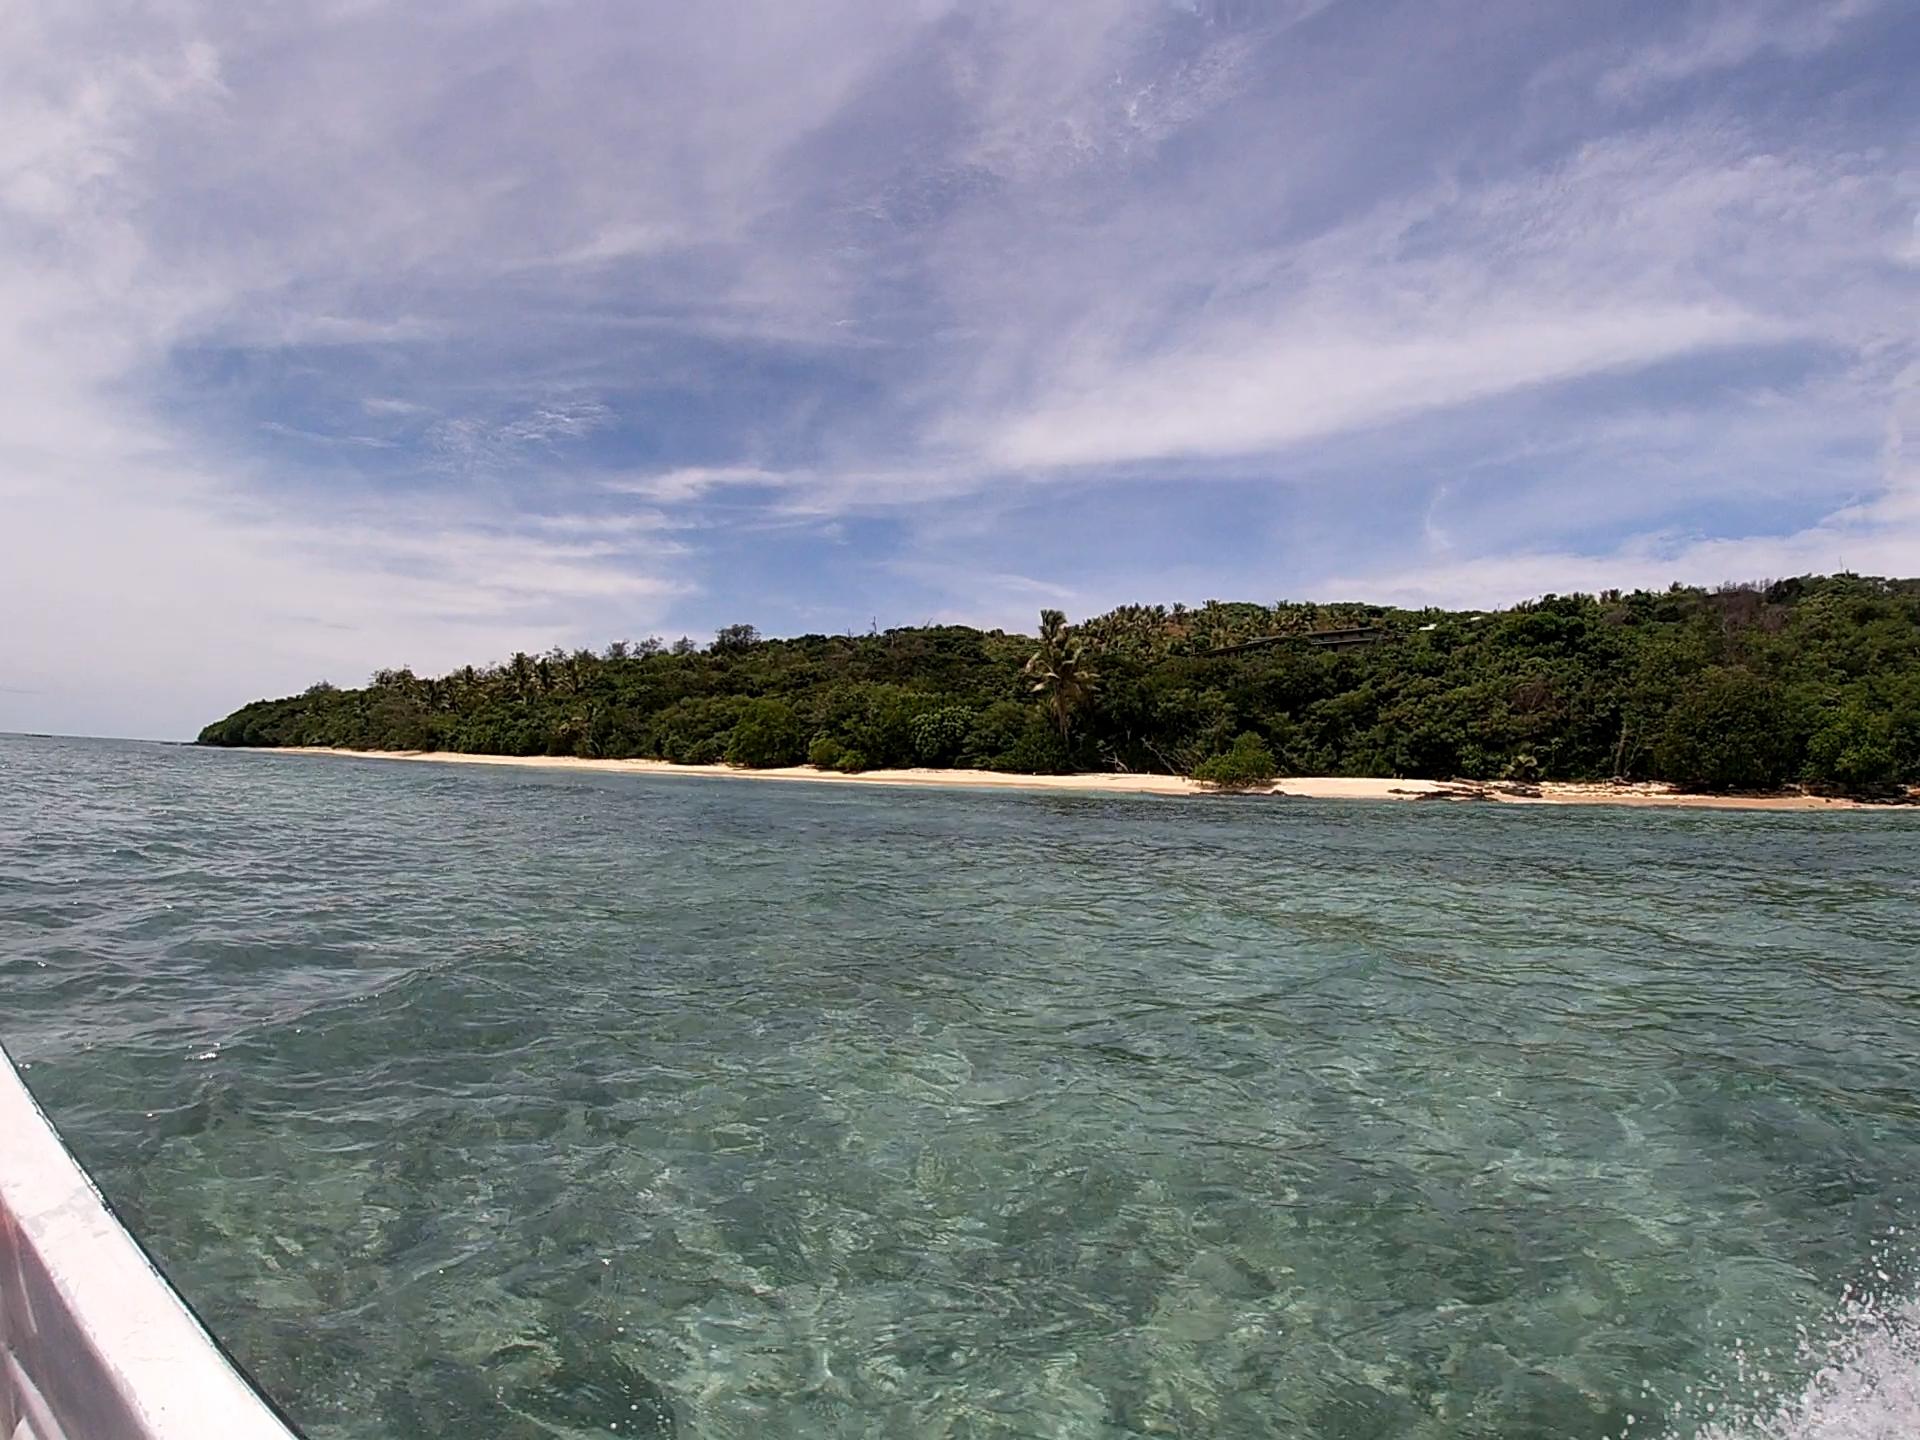 Kulturschock in Fiji [FIJI]